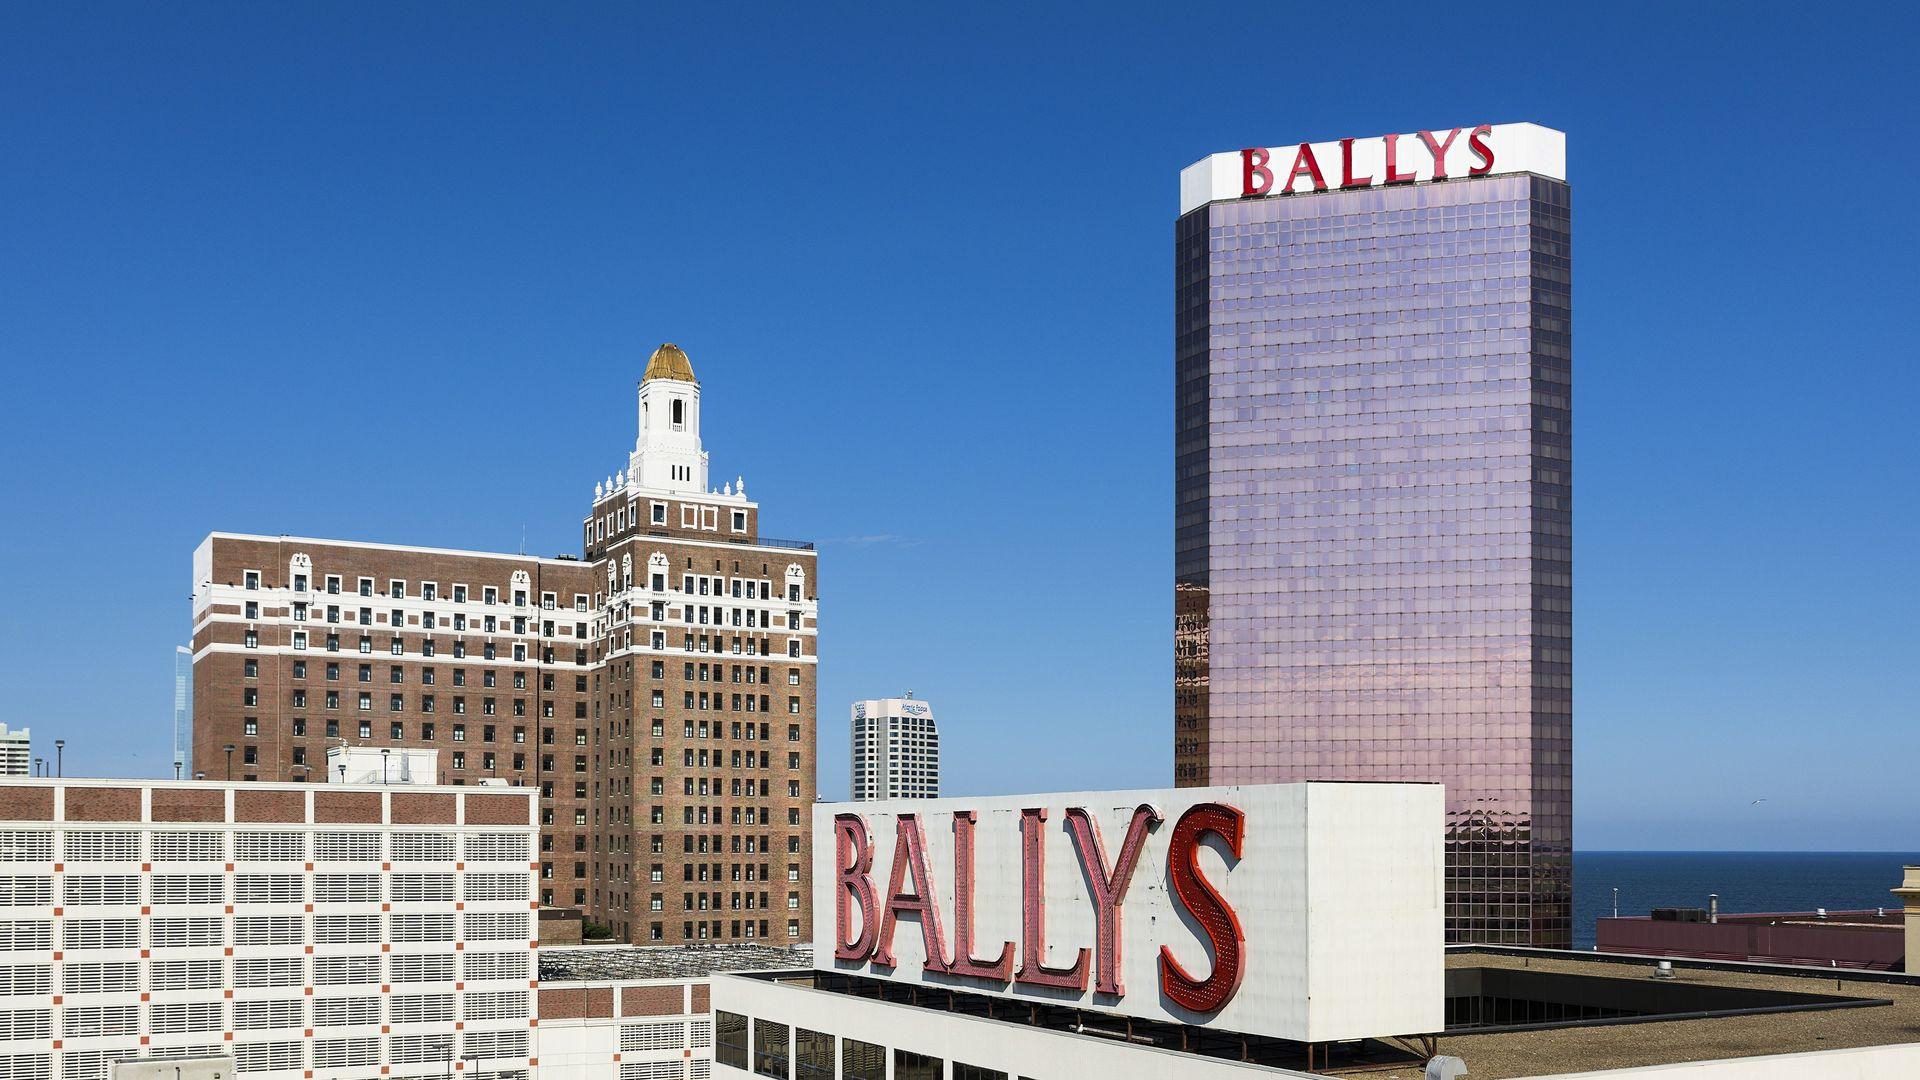 Casinos overlooking the Atlantic Ocean. (Photo by John Greim/LightRocket via Getty Images)